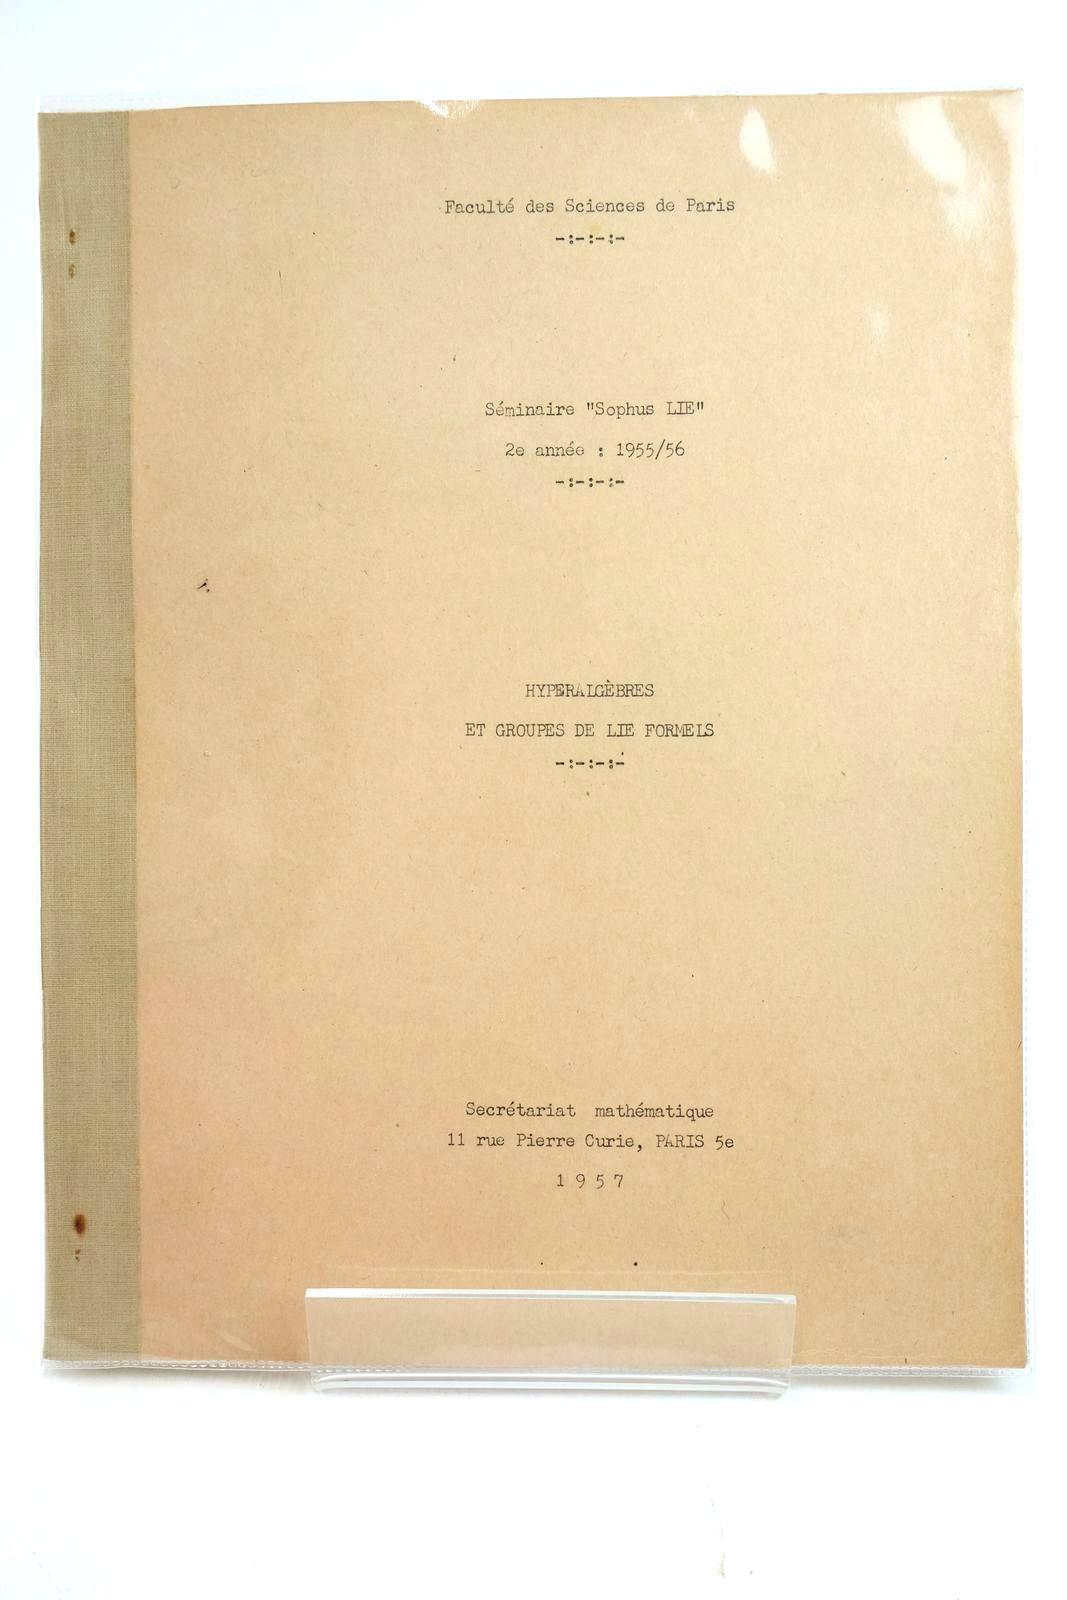 Photo of HYPERALGEBRES ET GROUPES DE LIE FORMELS written by Lazard, M. published by Secretariat Mathematique Paris (STOCK CODE: 1319128)  for sale by Stella & Rose's Books